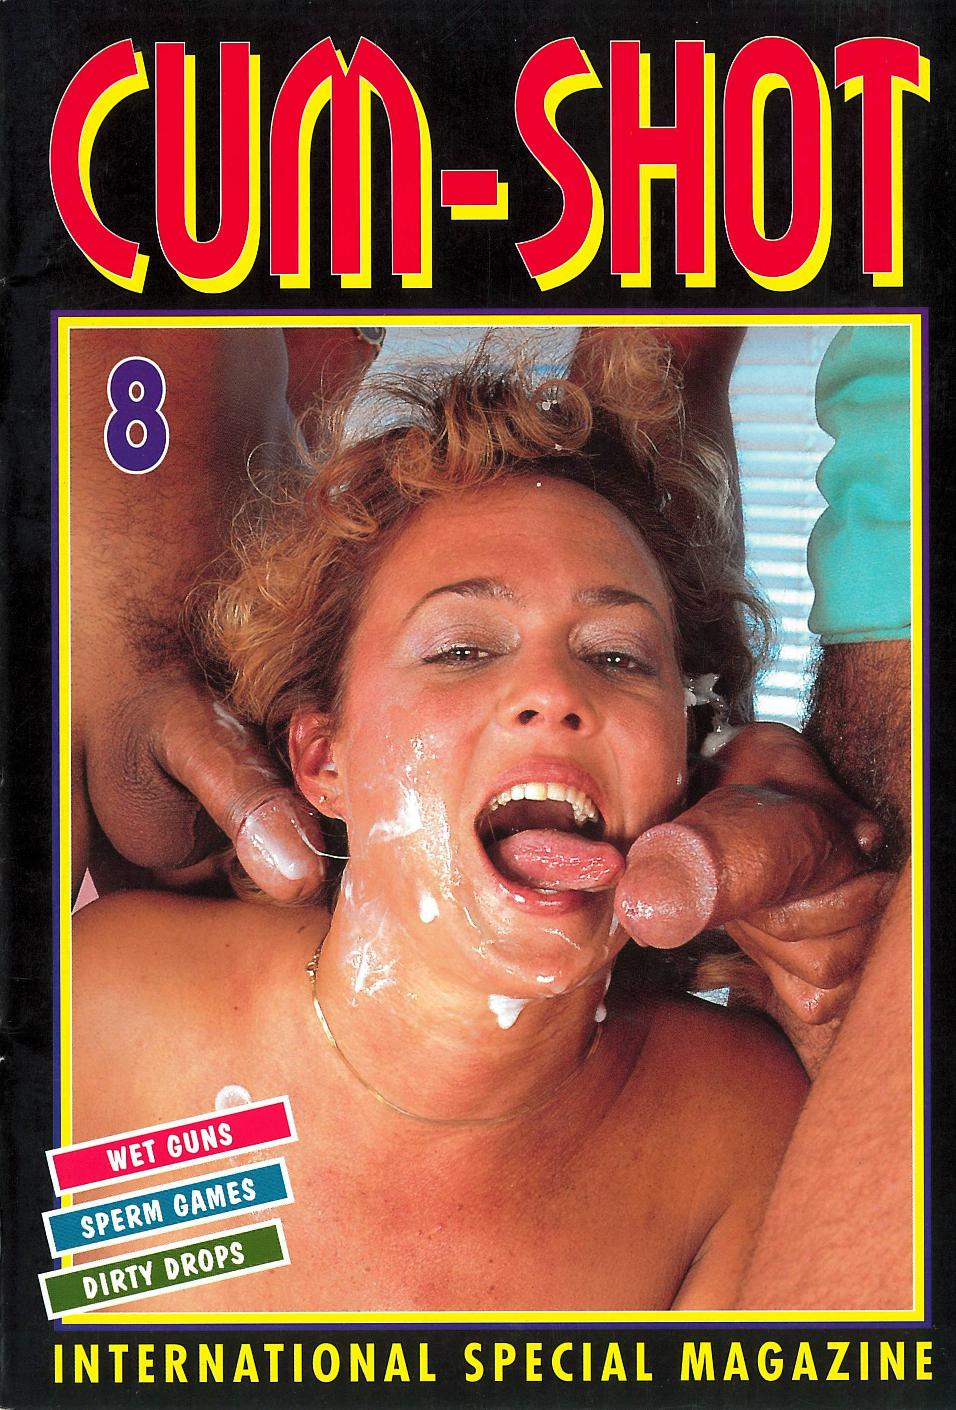 erotik vintage magazine archiv cum shot